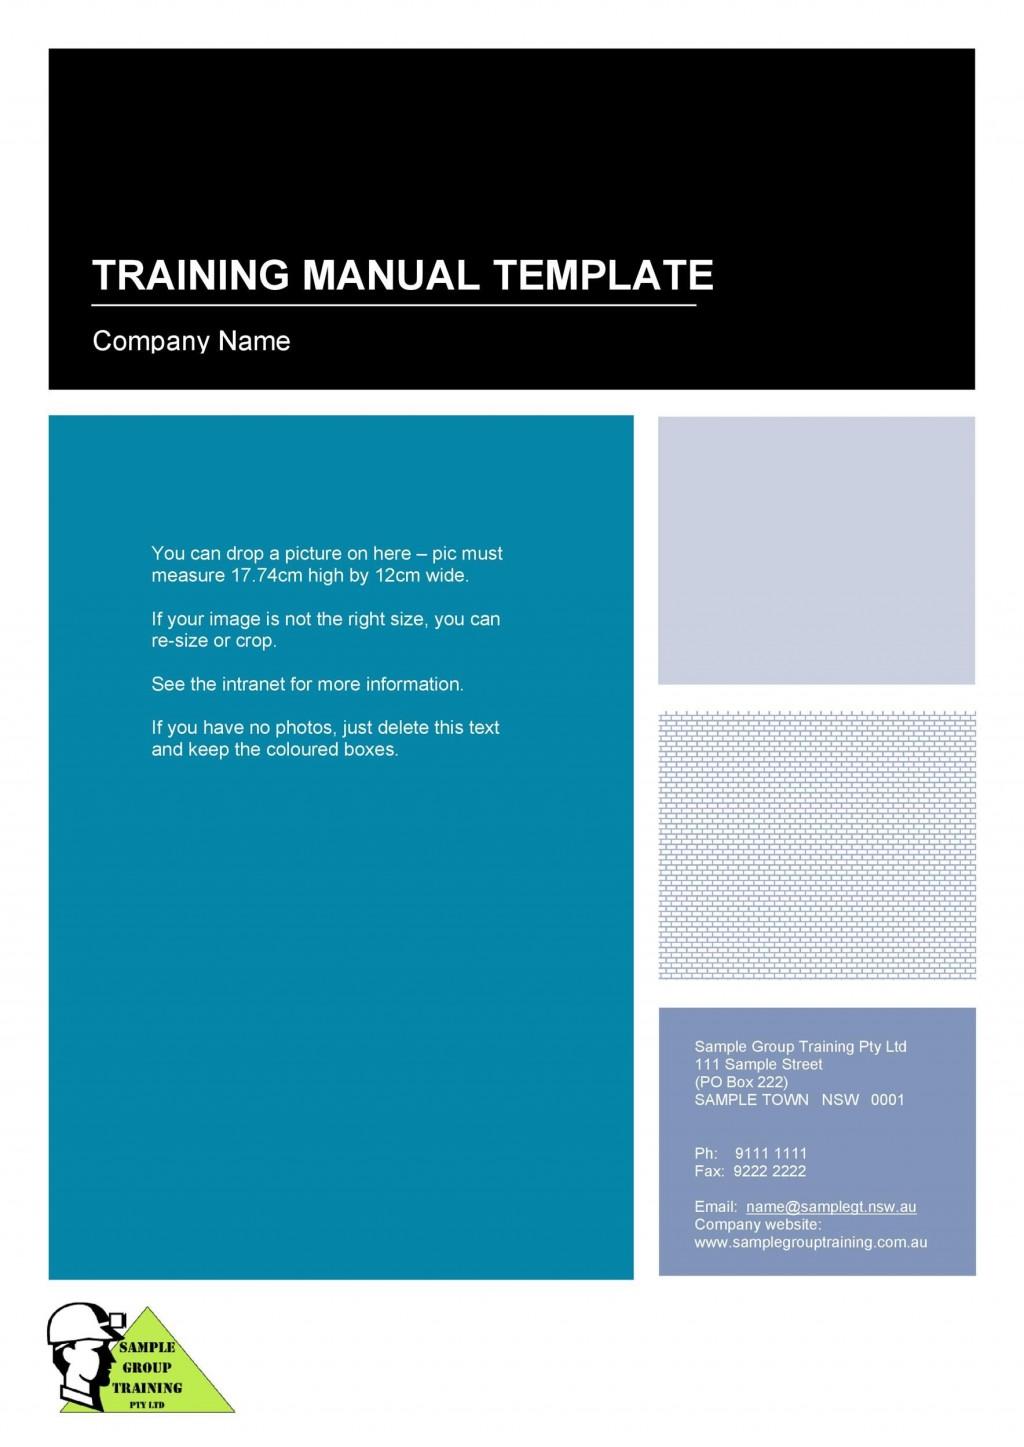 000 Phenomenal Employee Training Manual Template Inspiration  New Hire ExampleLarge